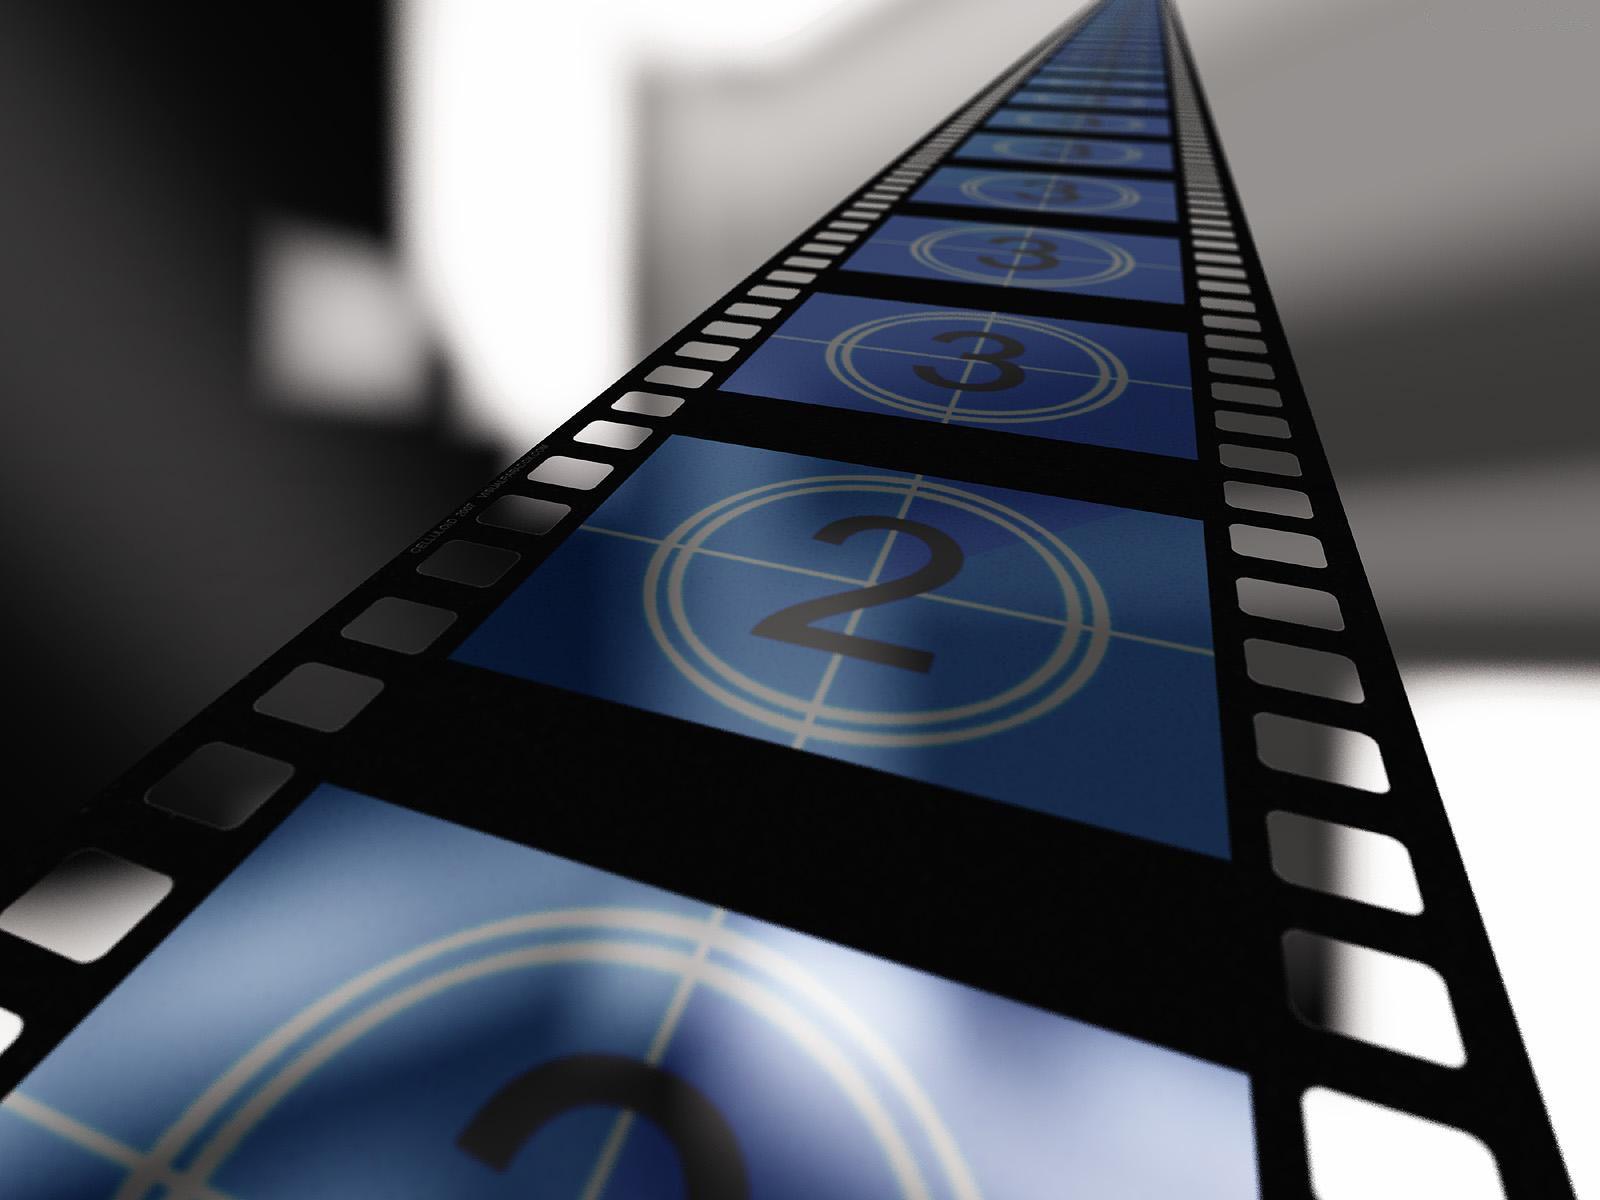 klisza filmowa